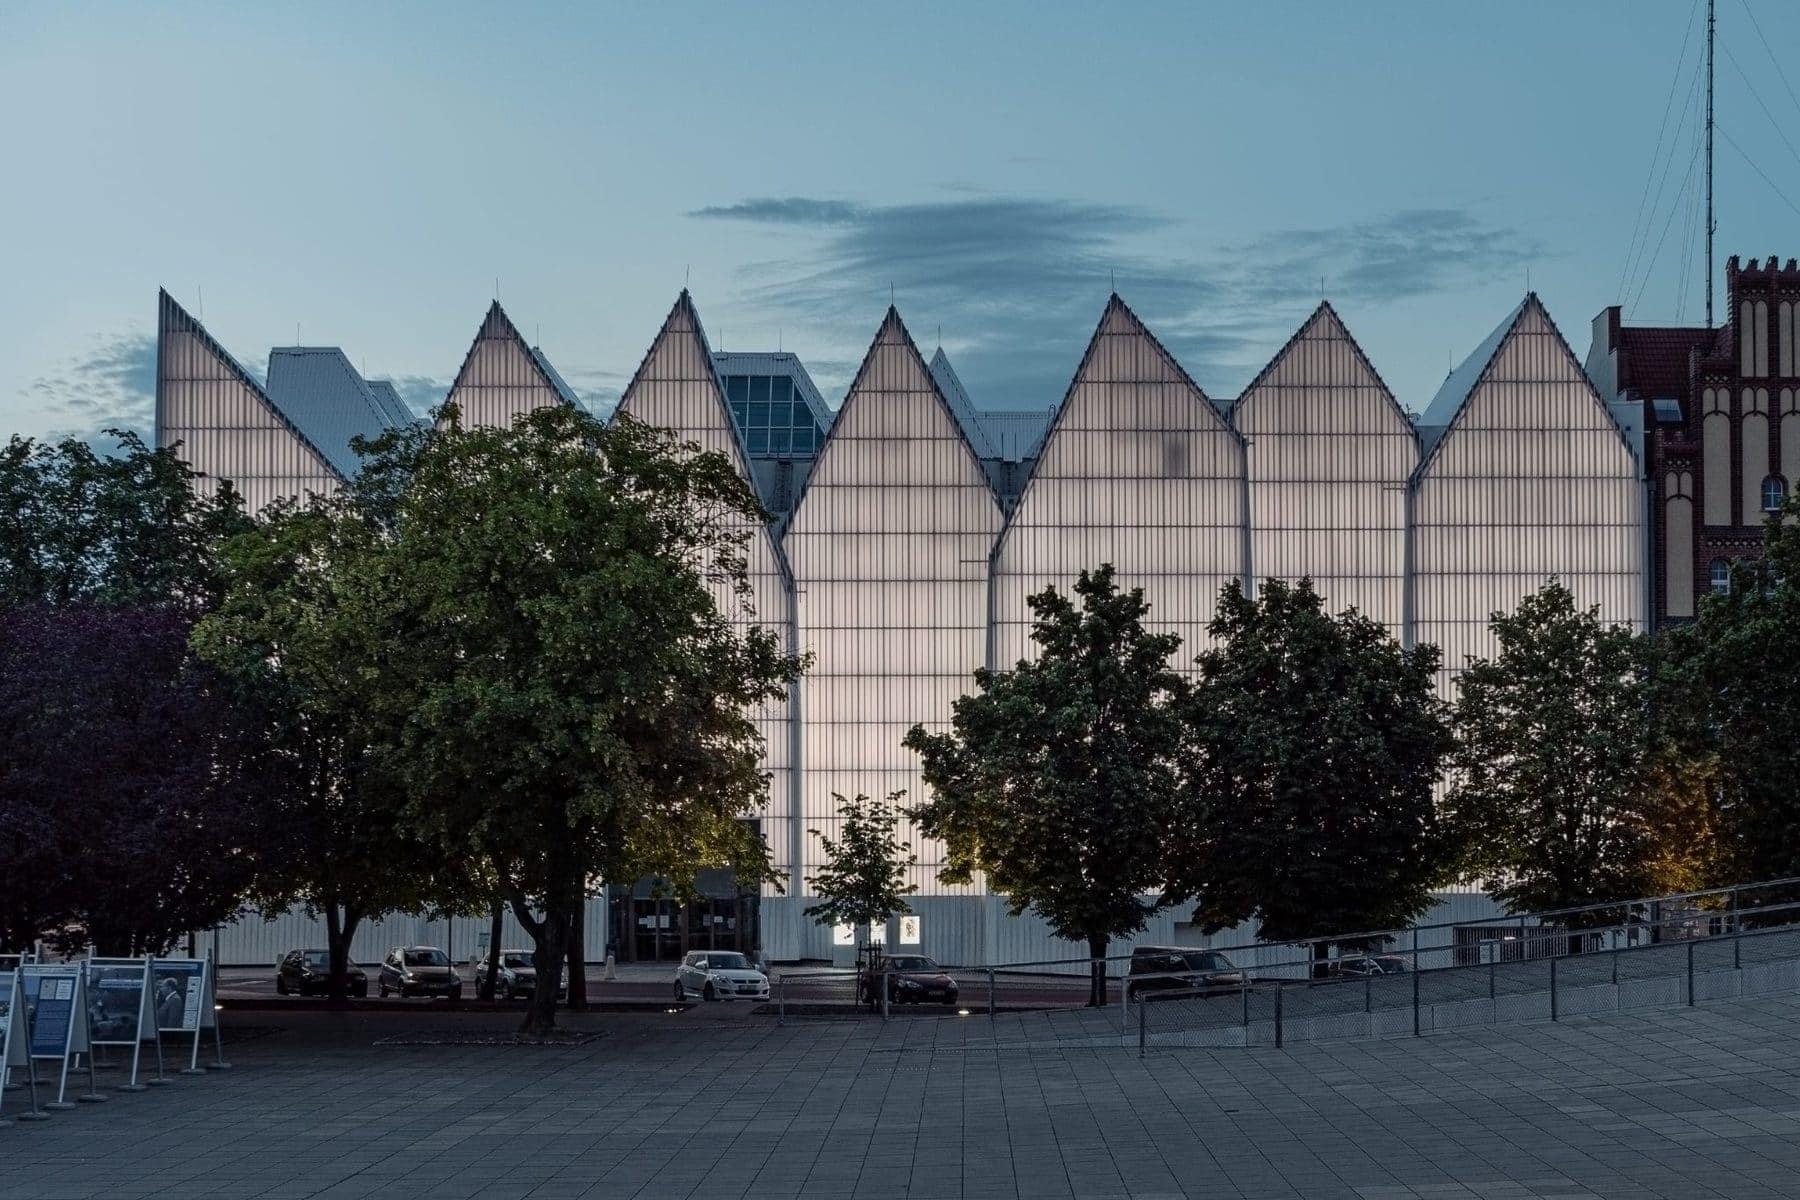 Philharmonic Hall Szczecin 1, 2019